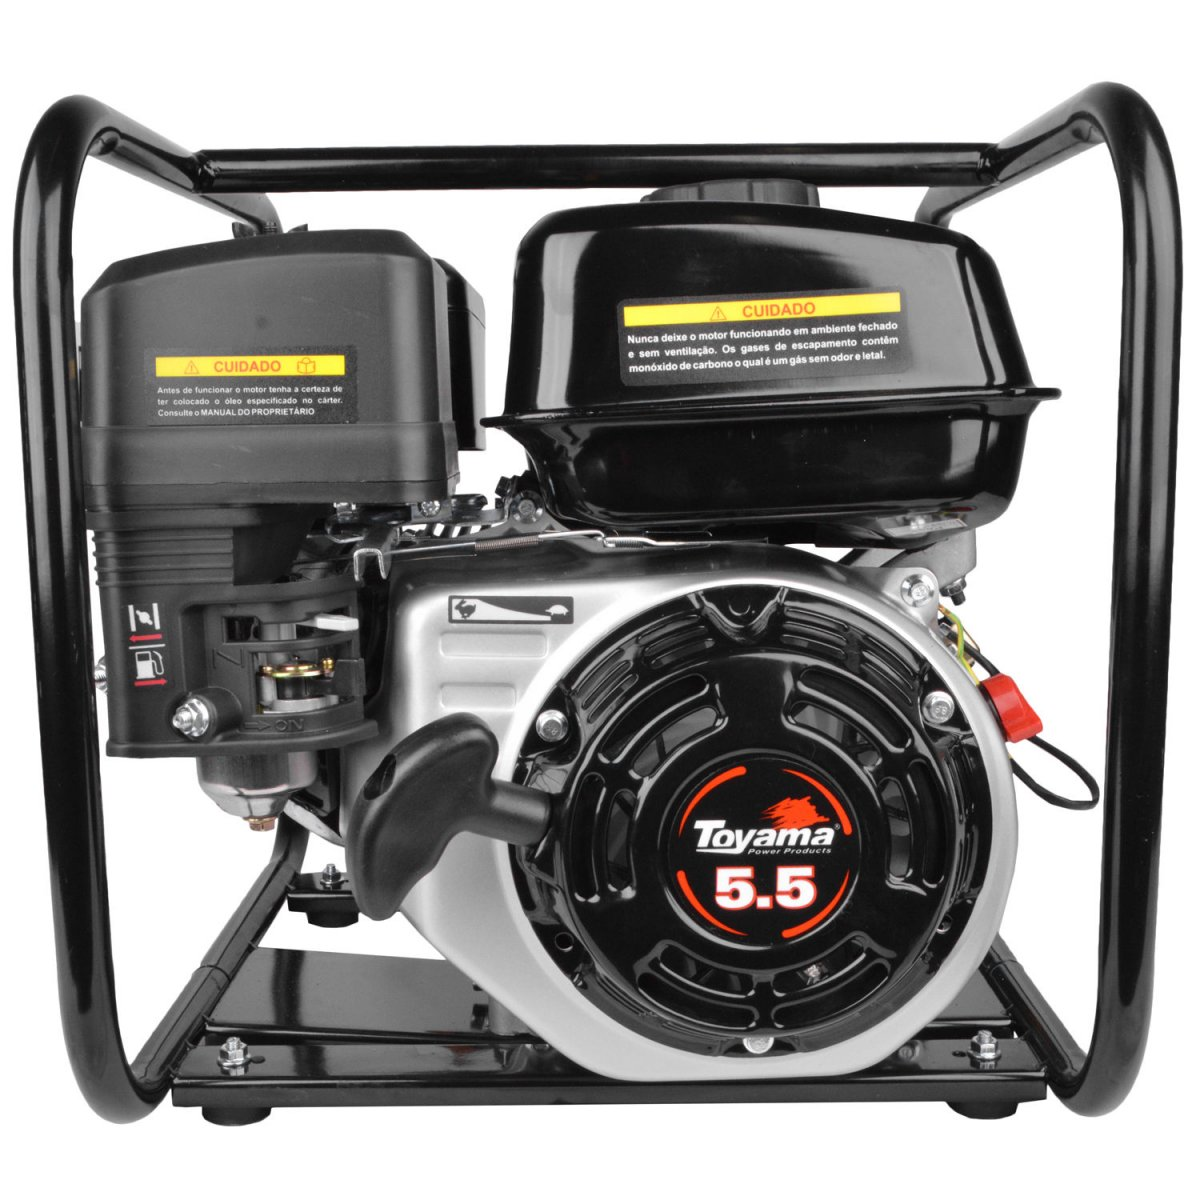 "Motobomba Gasolina Multi Estágio 1"" x 3/4"" TFM34C551 Toyama"